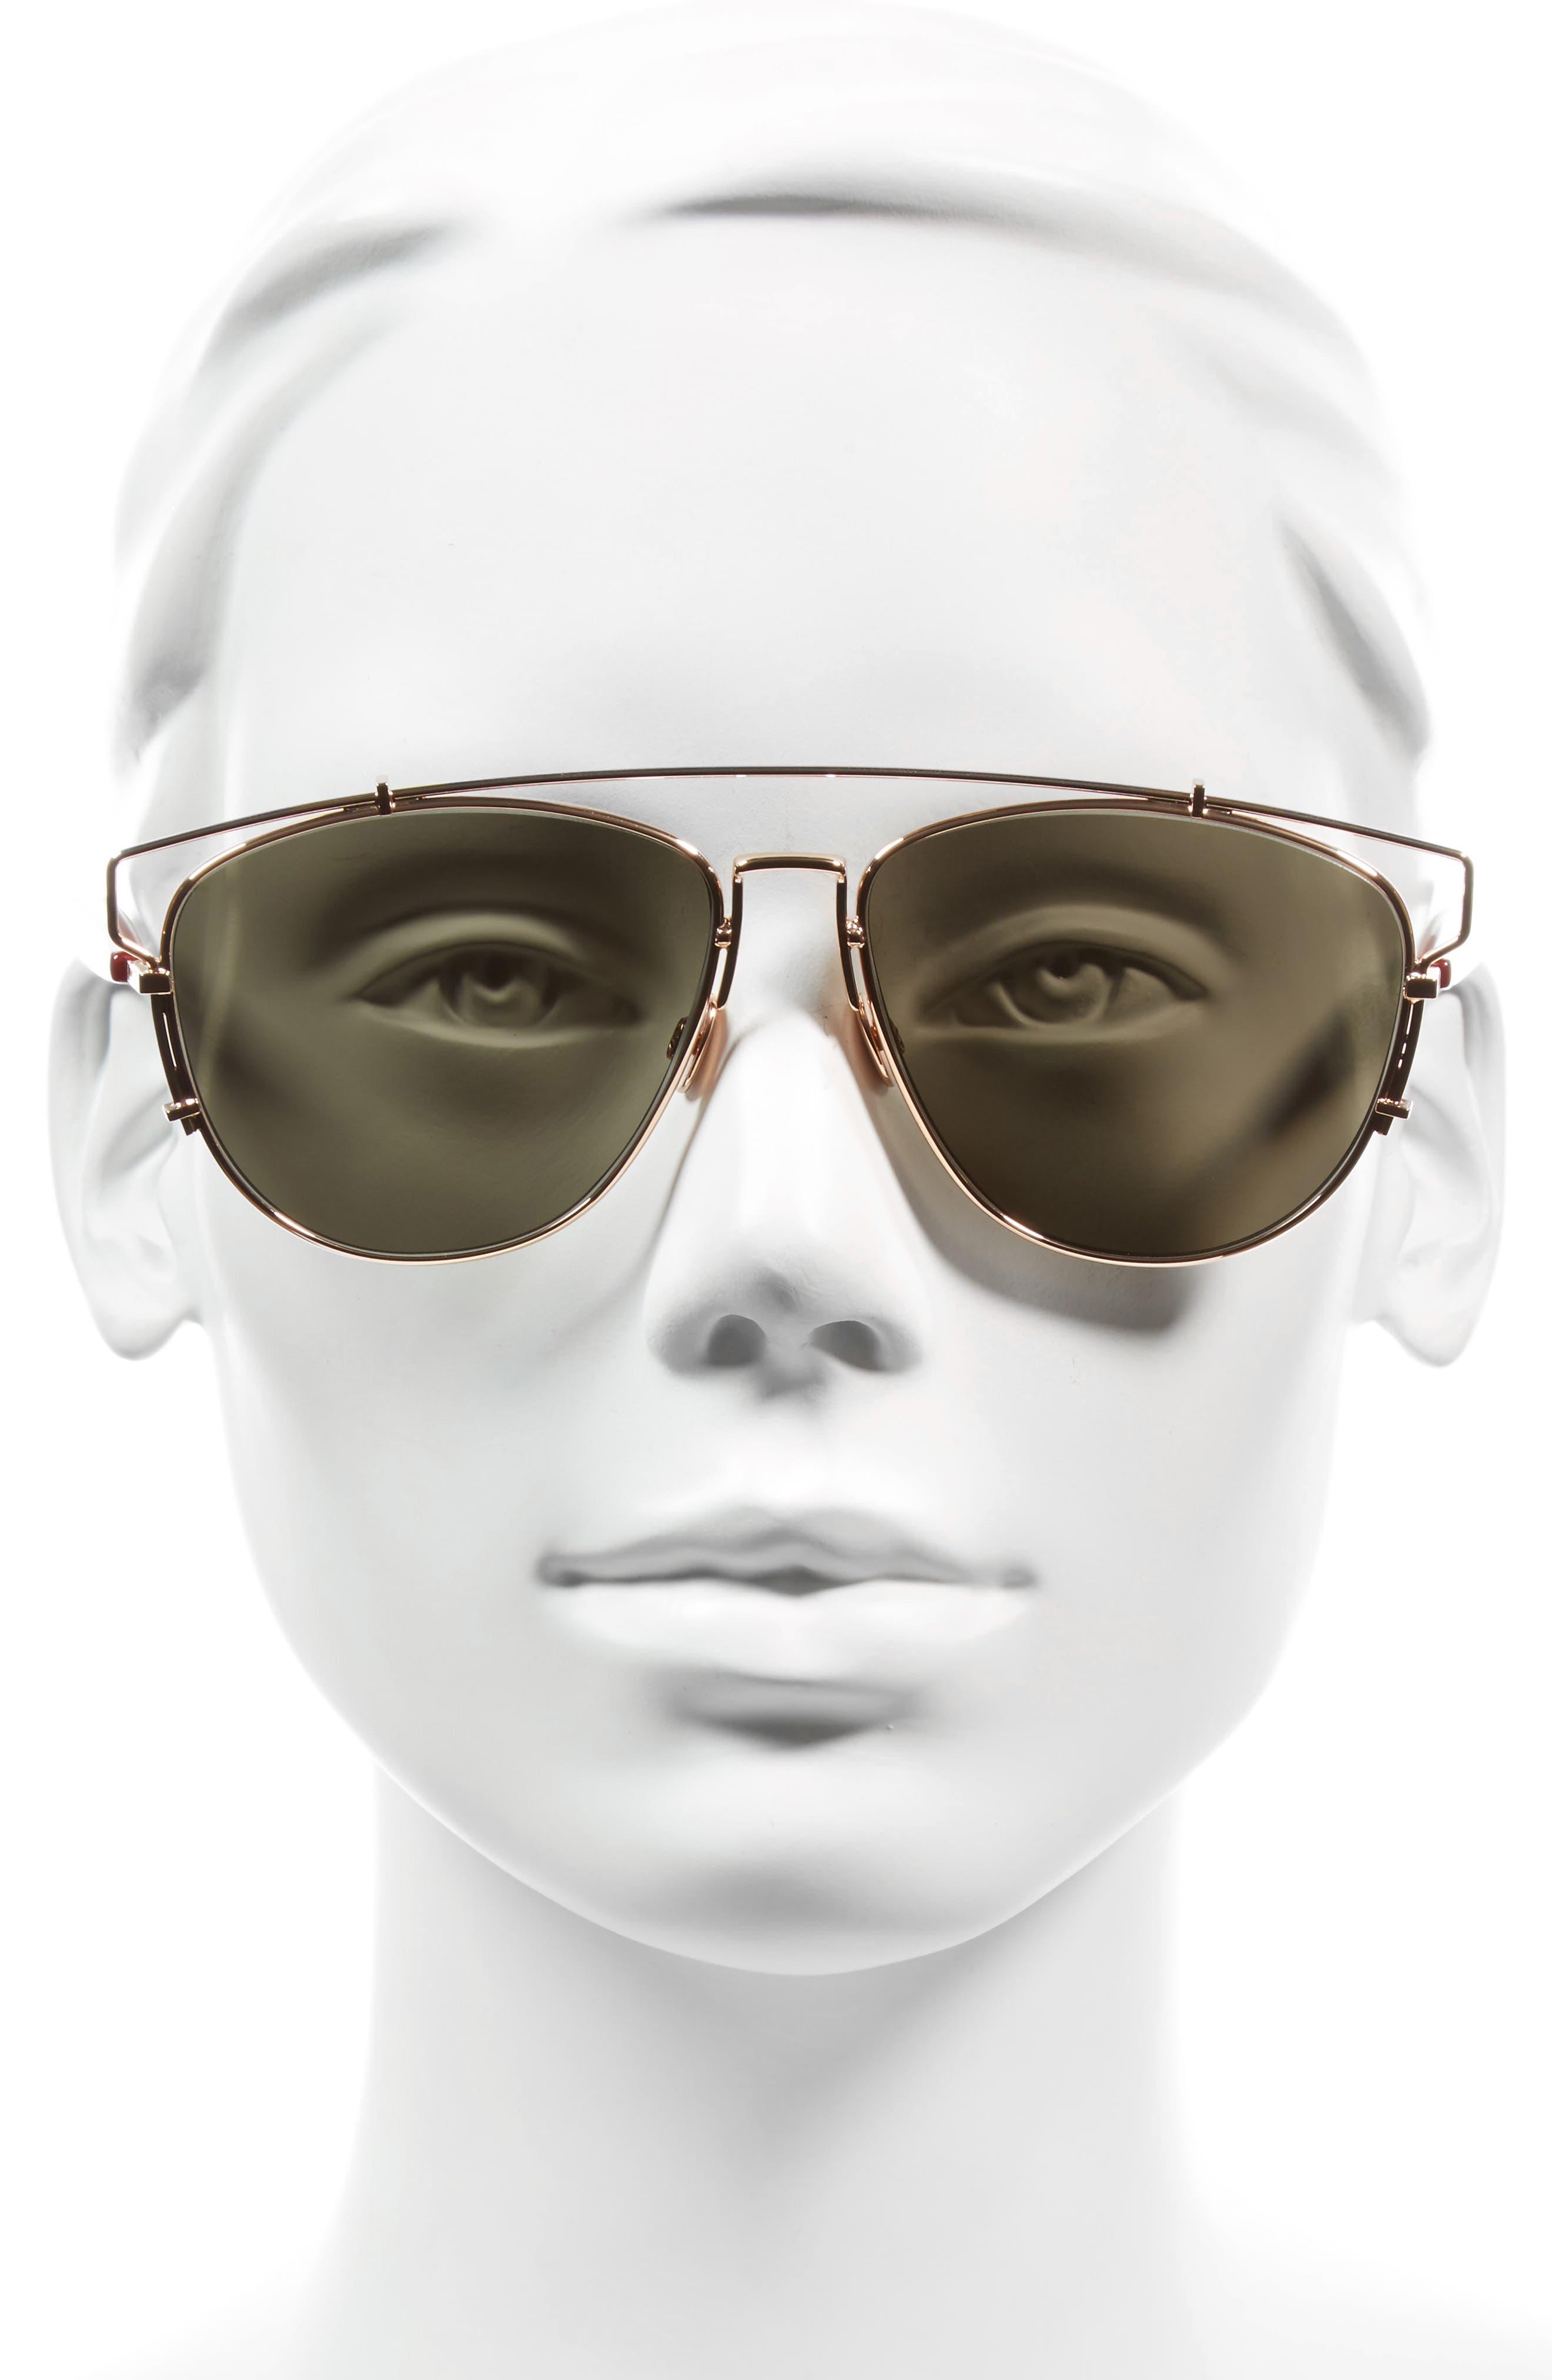 Technologic 57mm Brow Bar Sunglasses,                             Alternate thumbnail 2, color,                             Gold Copper/ Blue